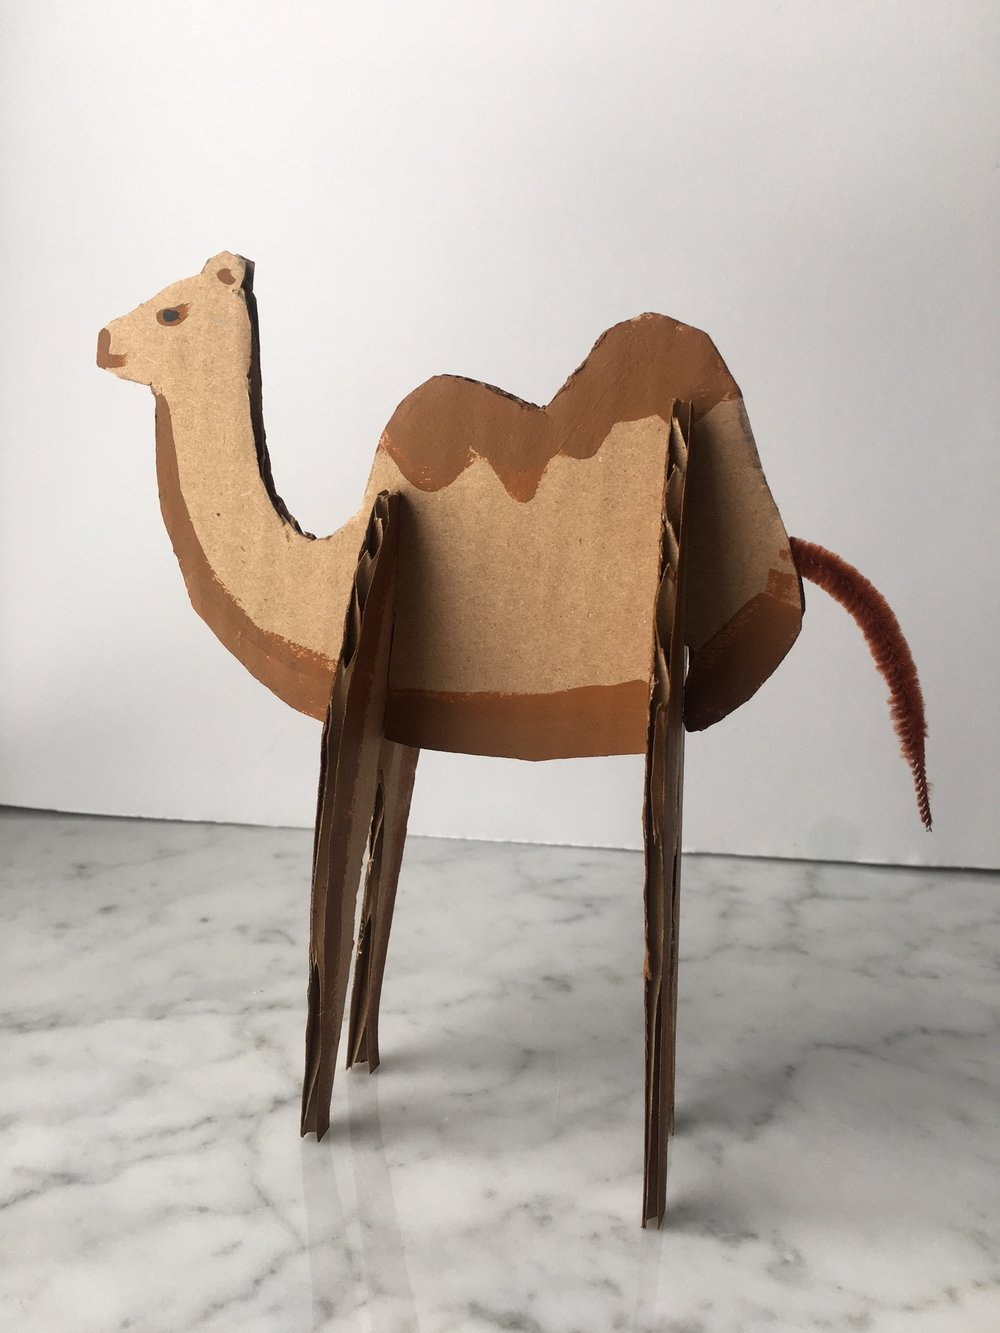 cardboard-camel